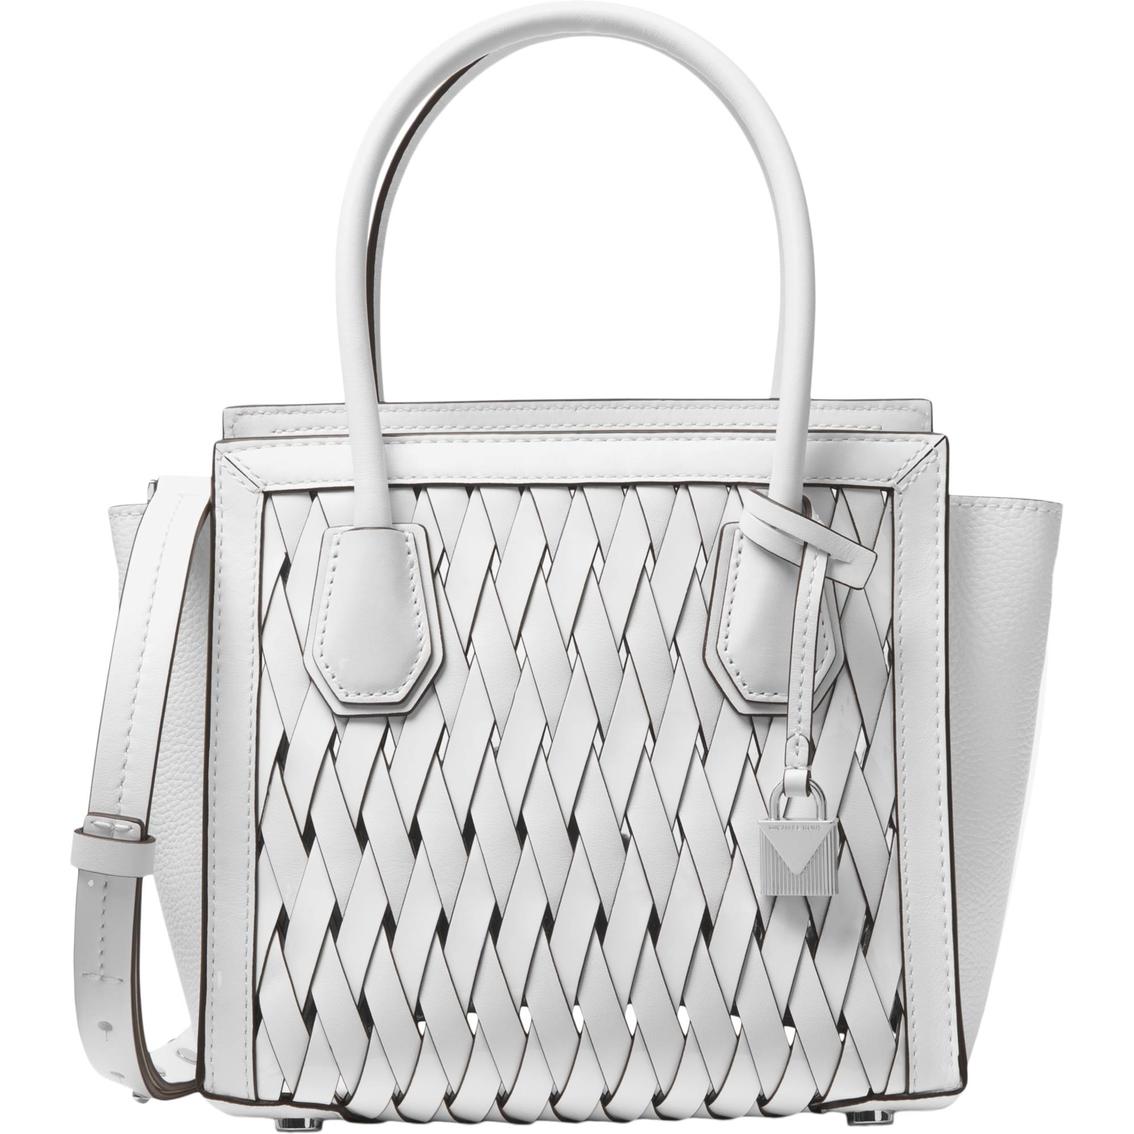 5f75a2ac6676 Michael Kors Mercer Studio Messenger Bag Leather   Handbags   Shop ...